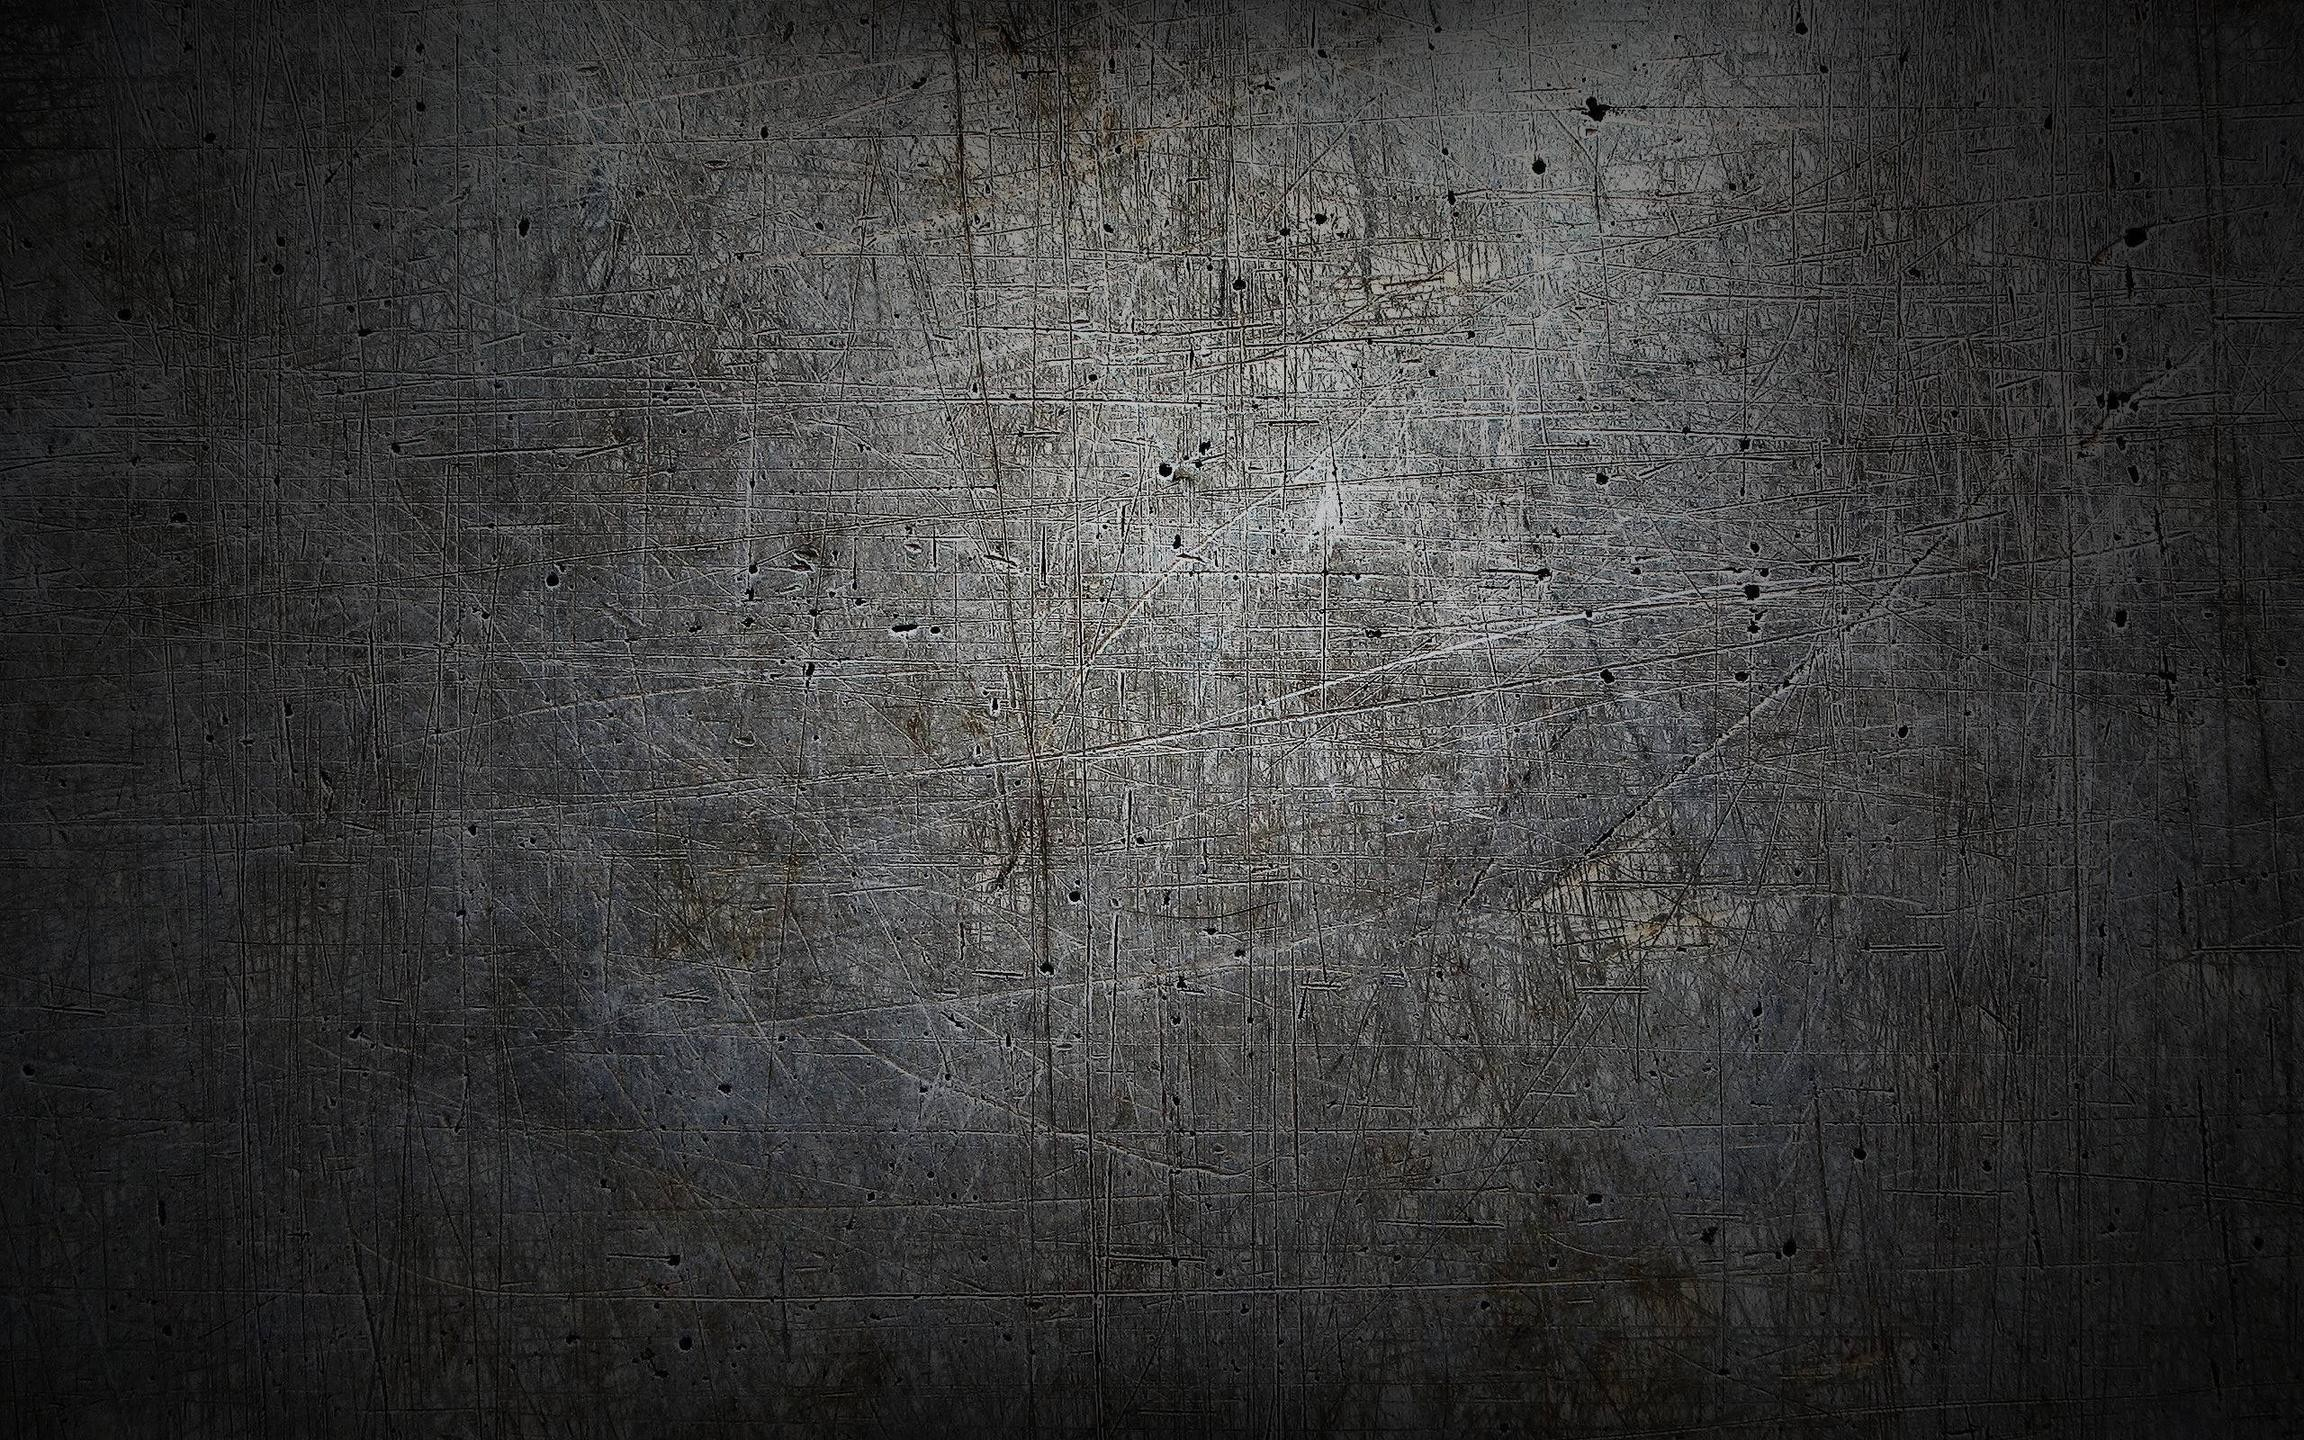 metal-texture-wallpaper-wallpapertoon.jpg (2304×1440)